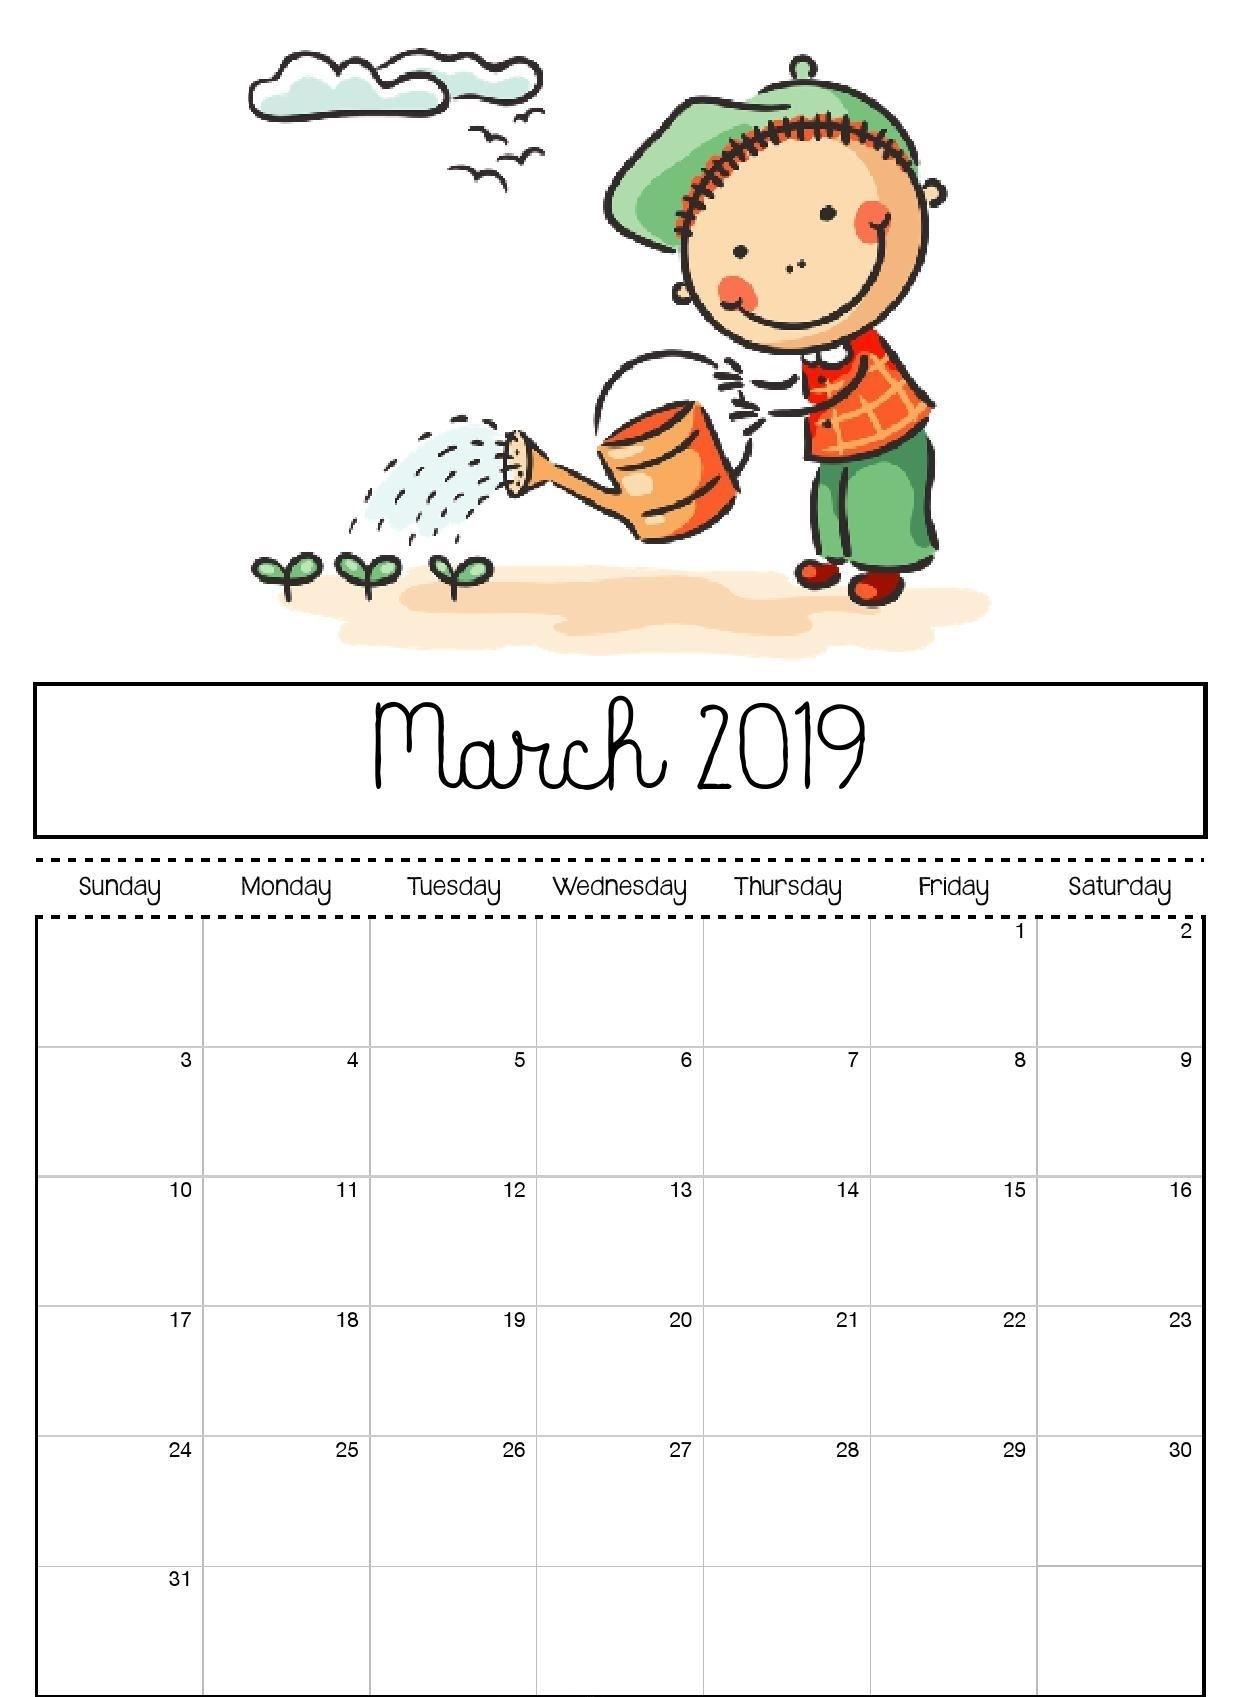 March 2019 Printable Calendar For Kids | Kids Calendar